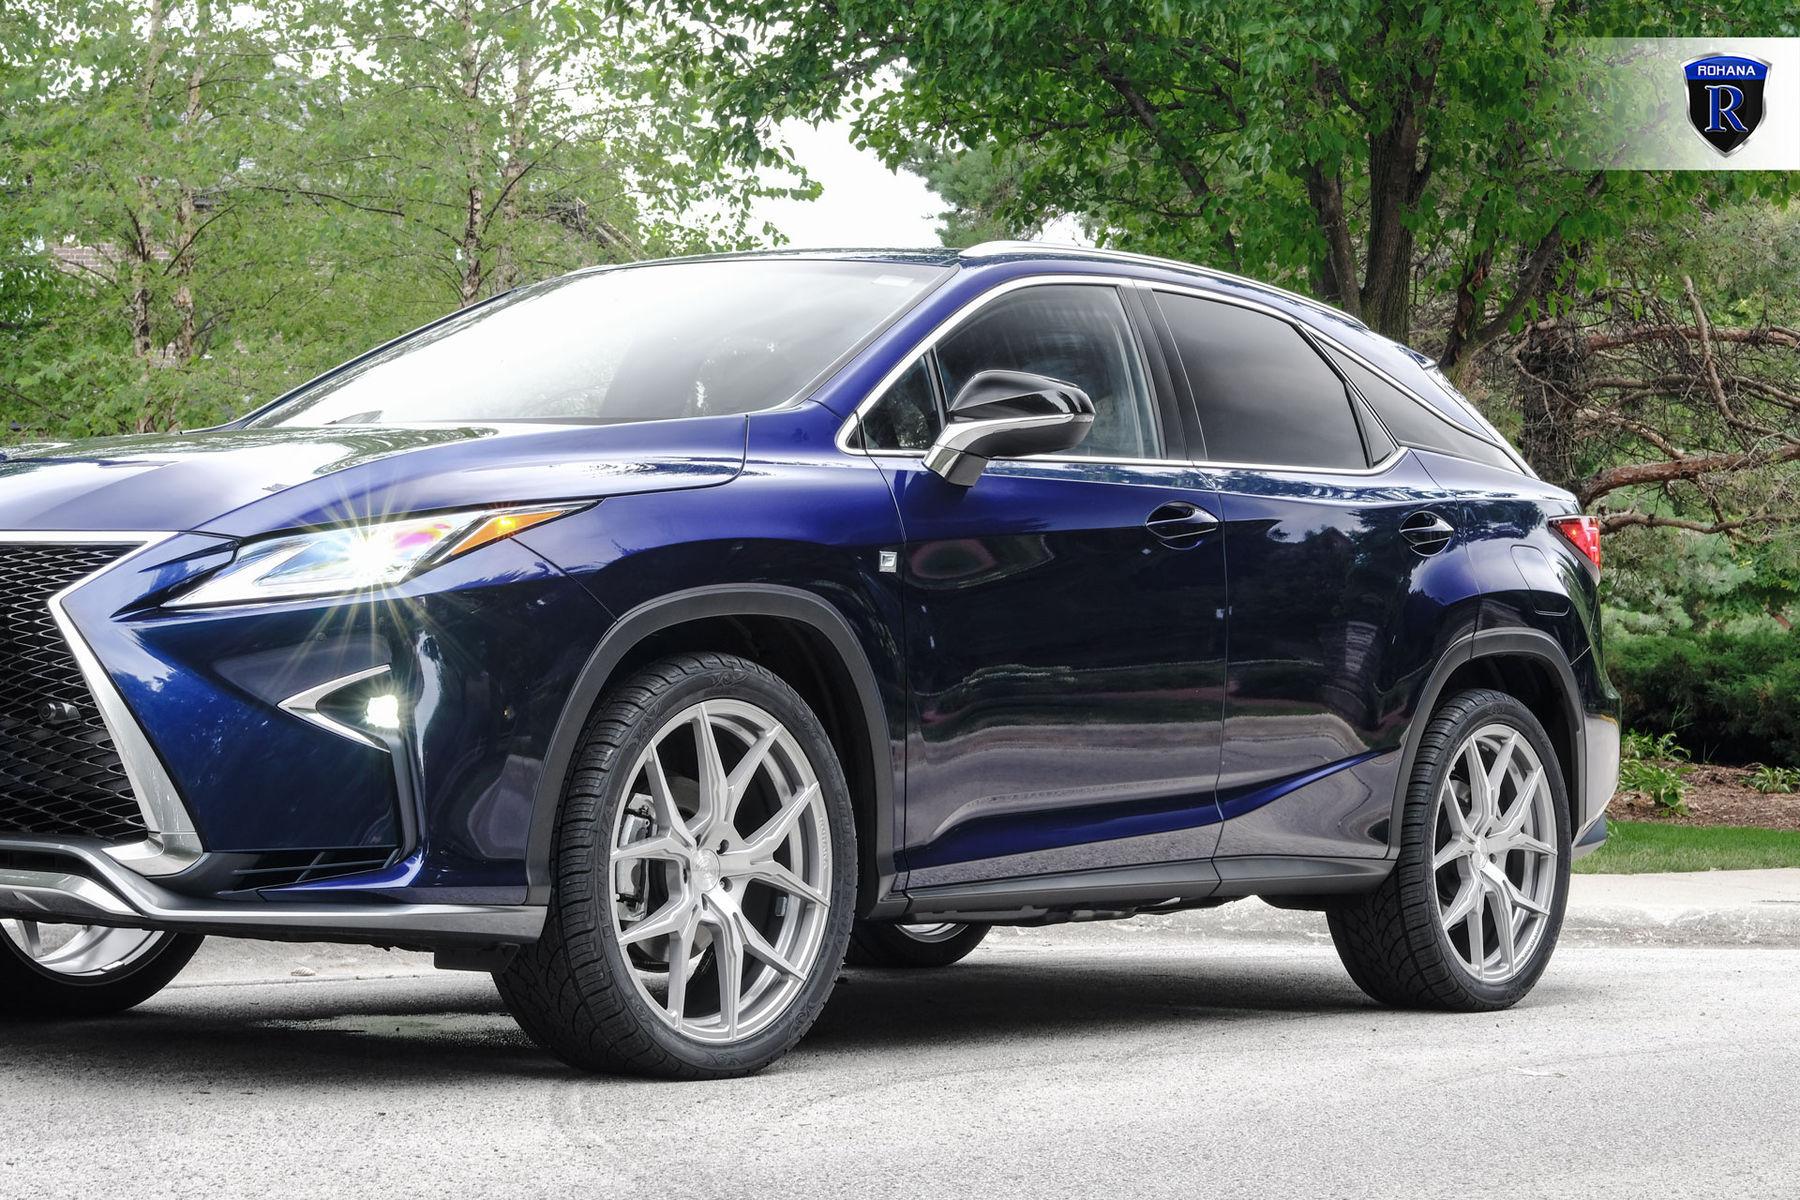 2017 Lexus RX 350 | Lexus RX350